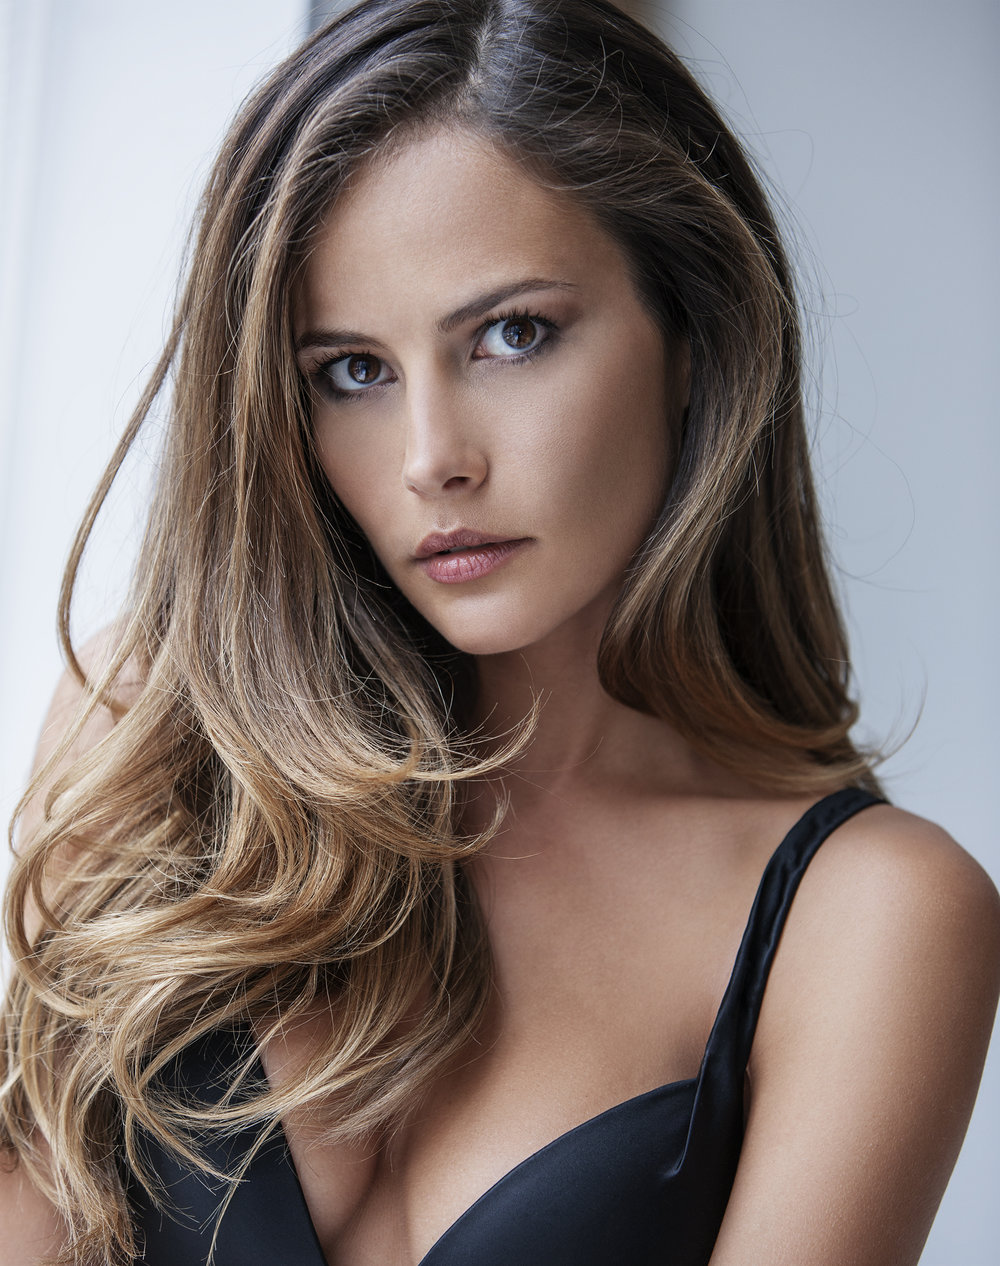 Natalia_Beauty_2-044crp.jpg